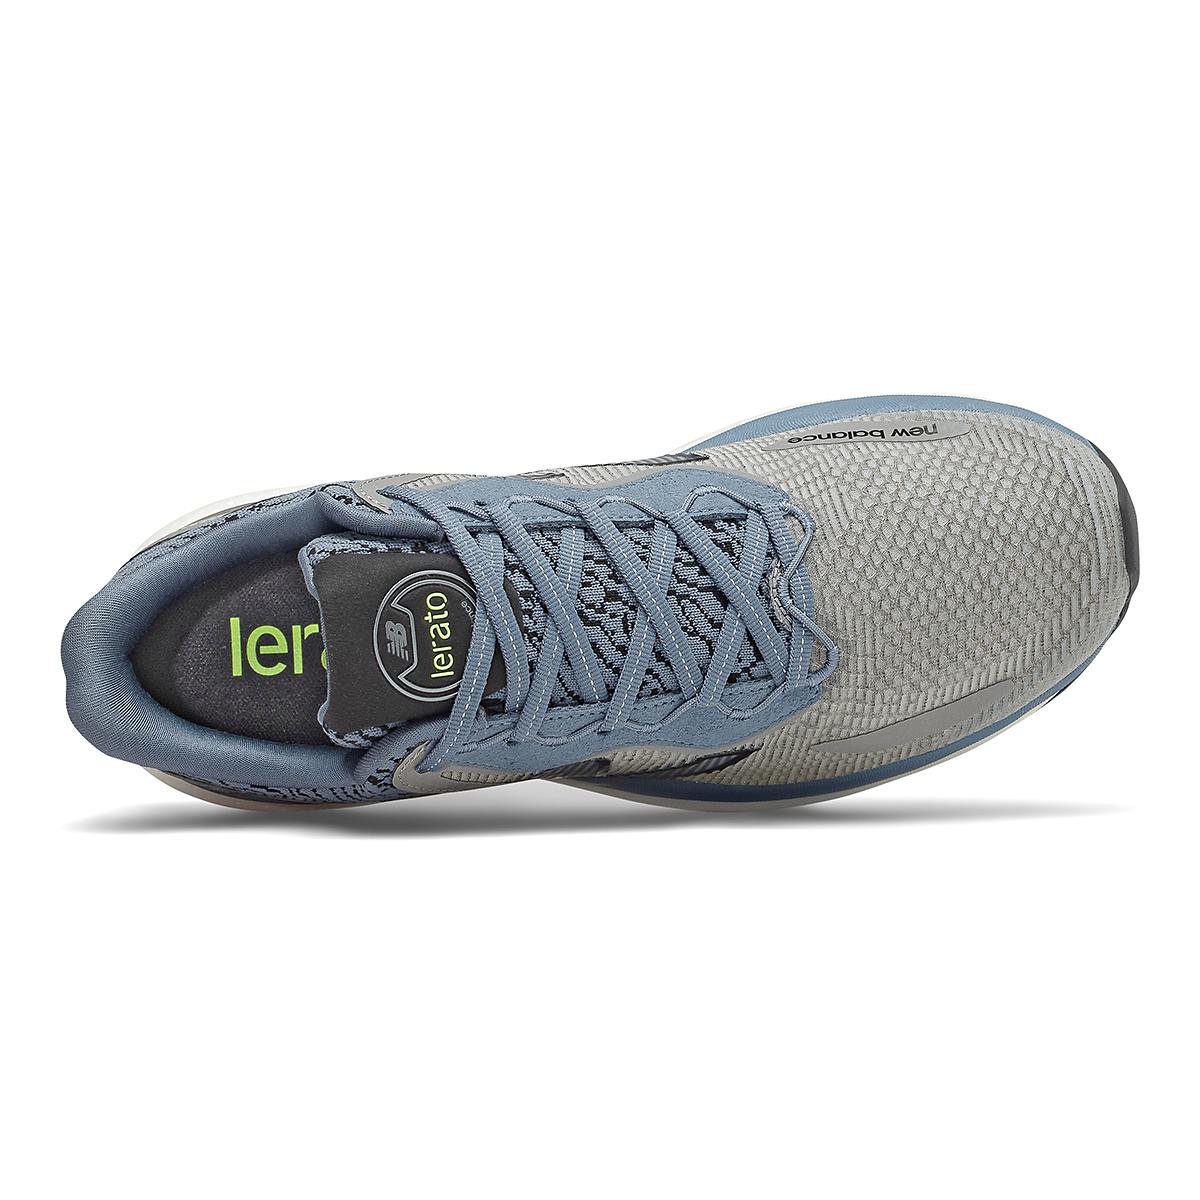 Men's New Balance Lerato Running Shoe, , large, image 3